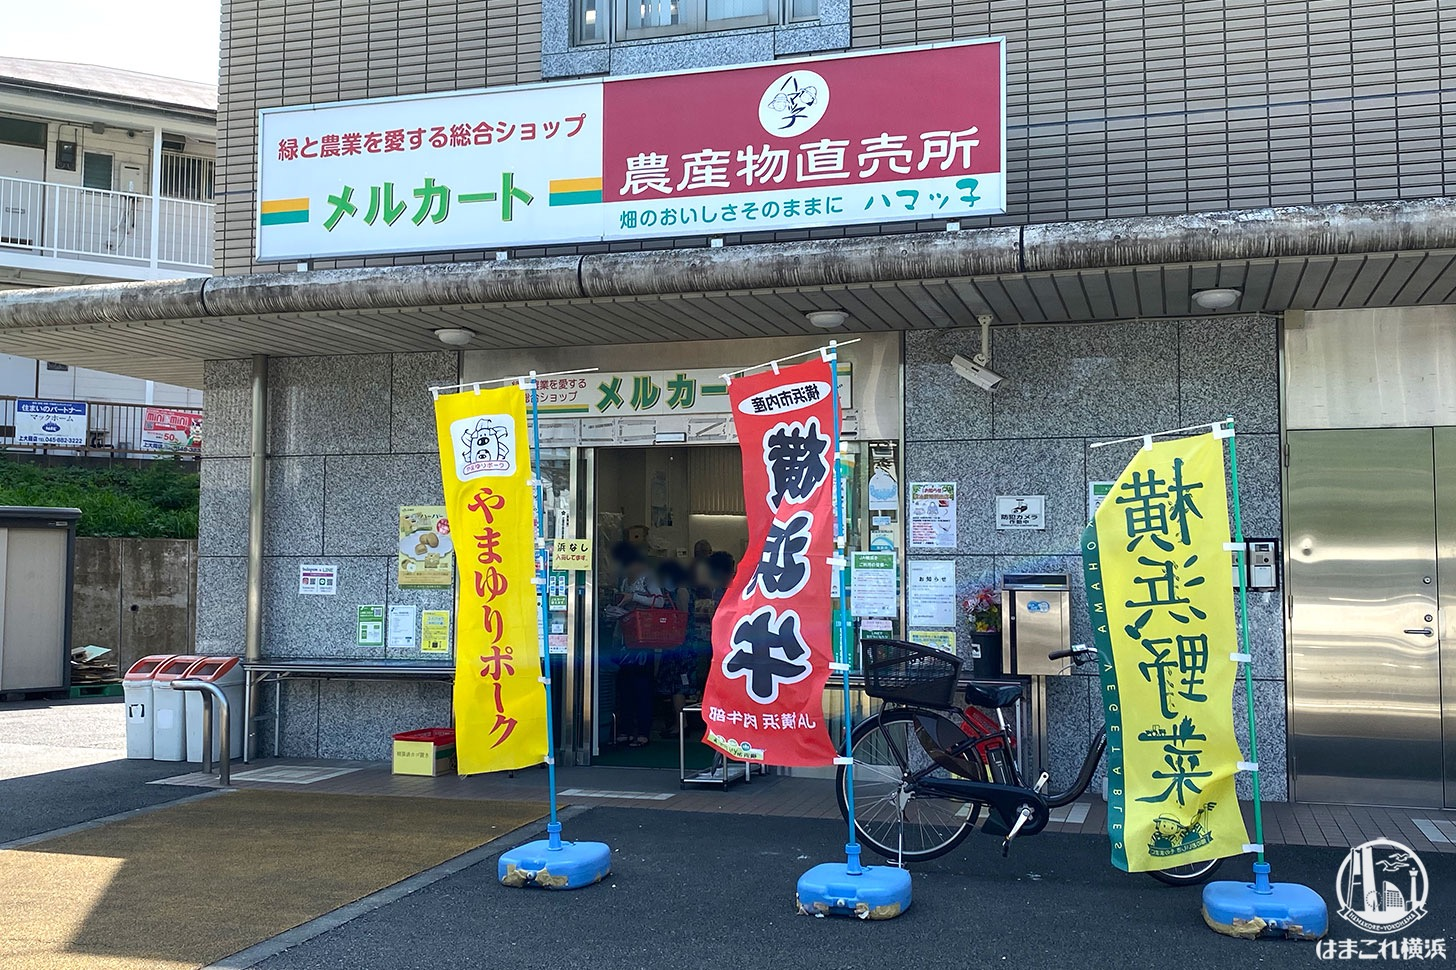 JA横浜「ハマっ子」直売所メルカートいそご店